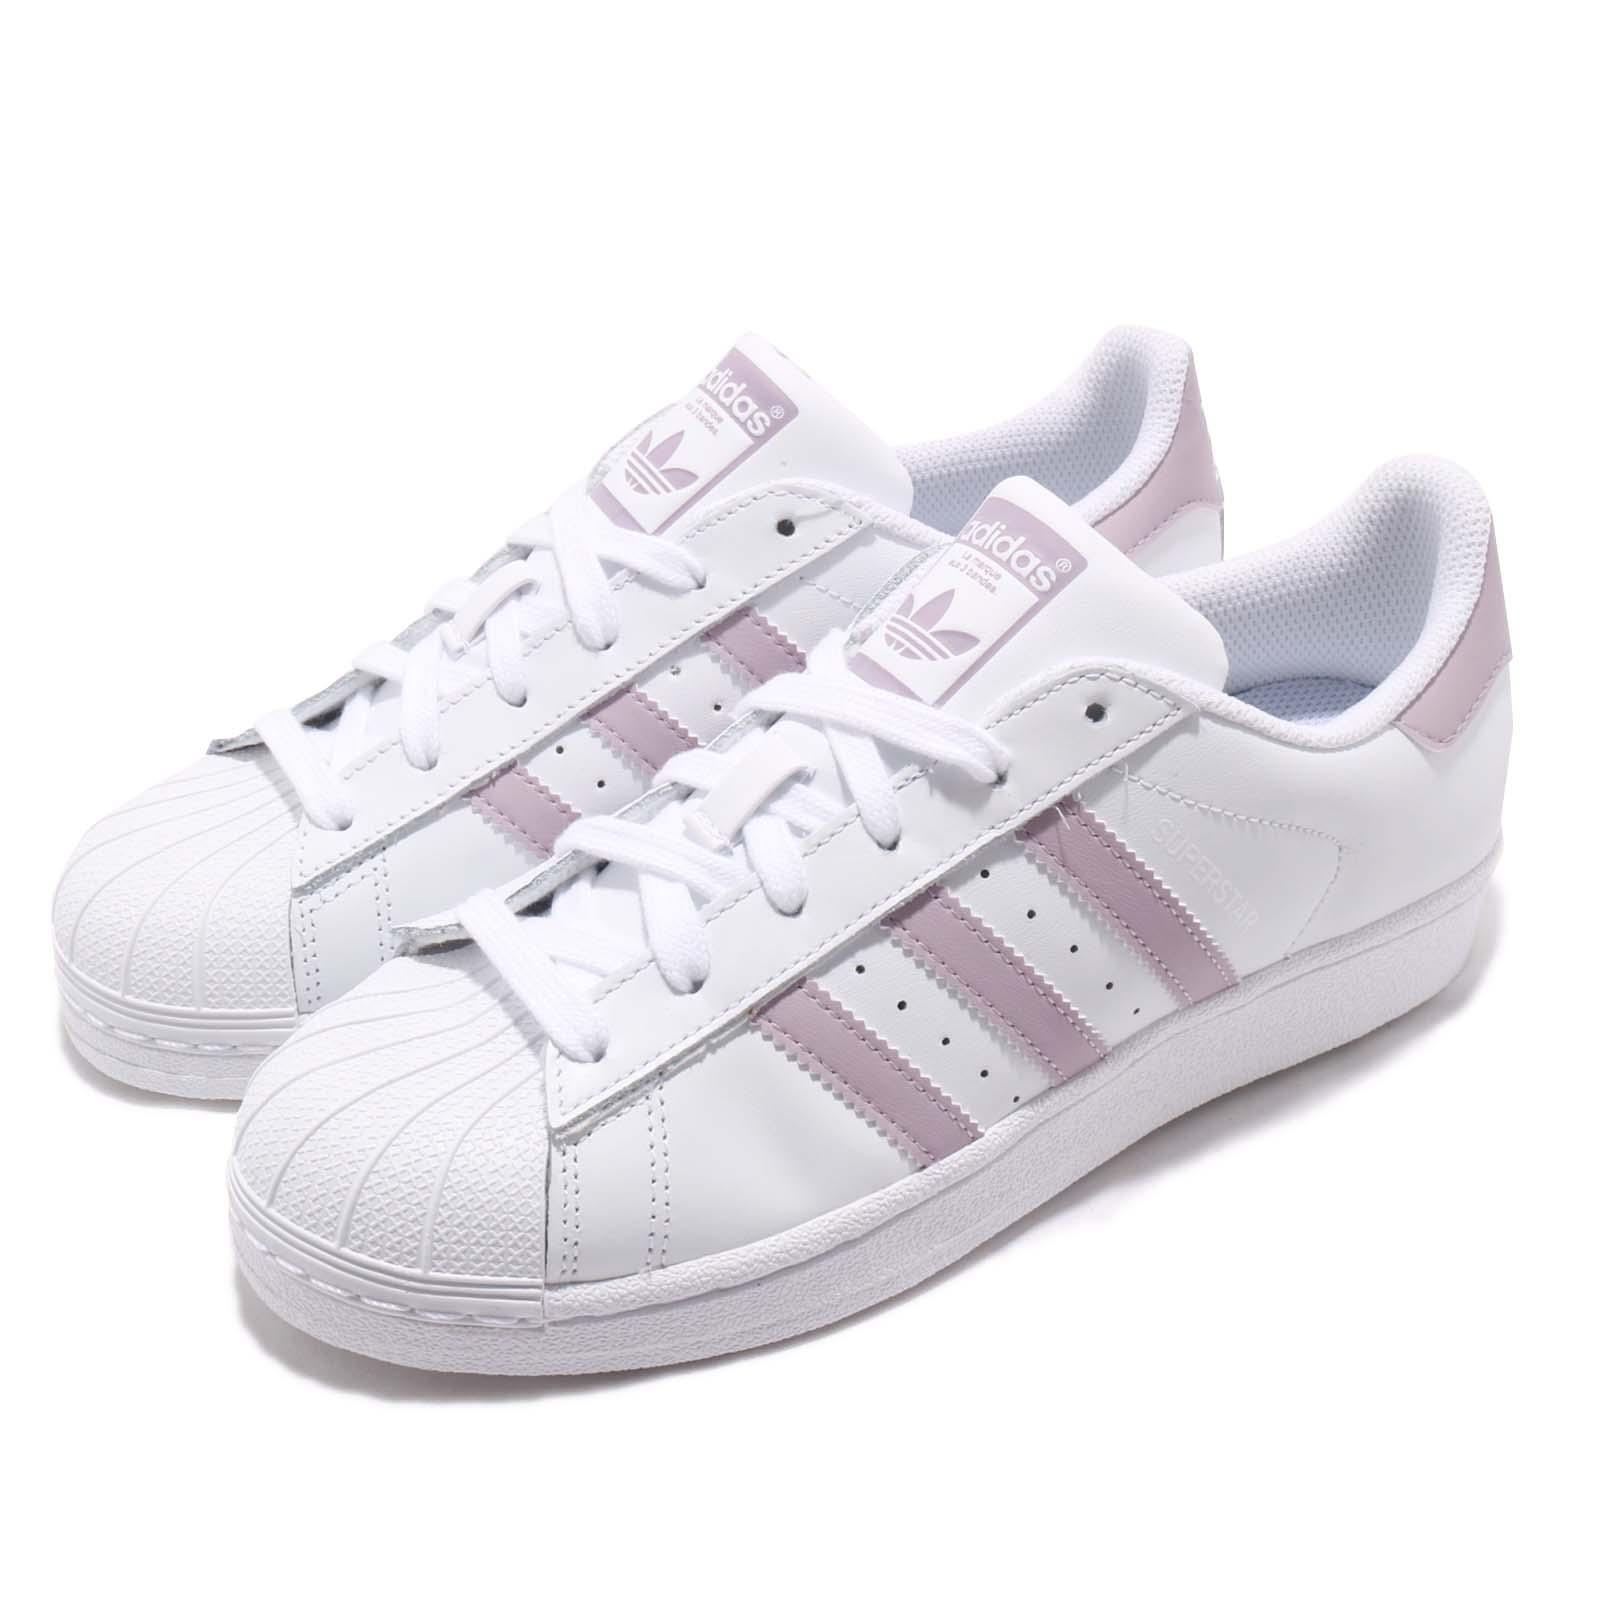 adidas 休閒鞋 Superstar 低筒 運動 女鞋 DB3347